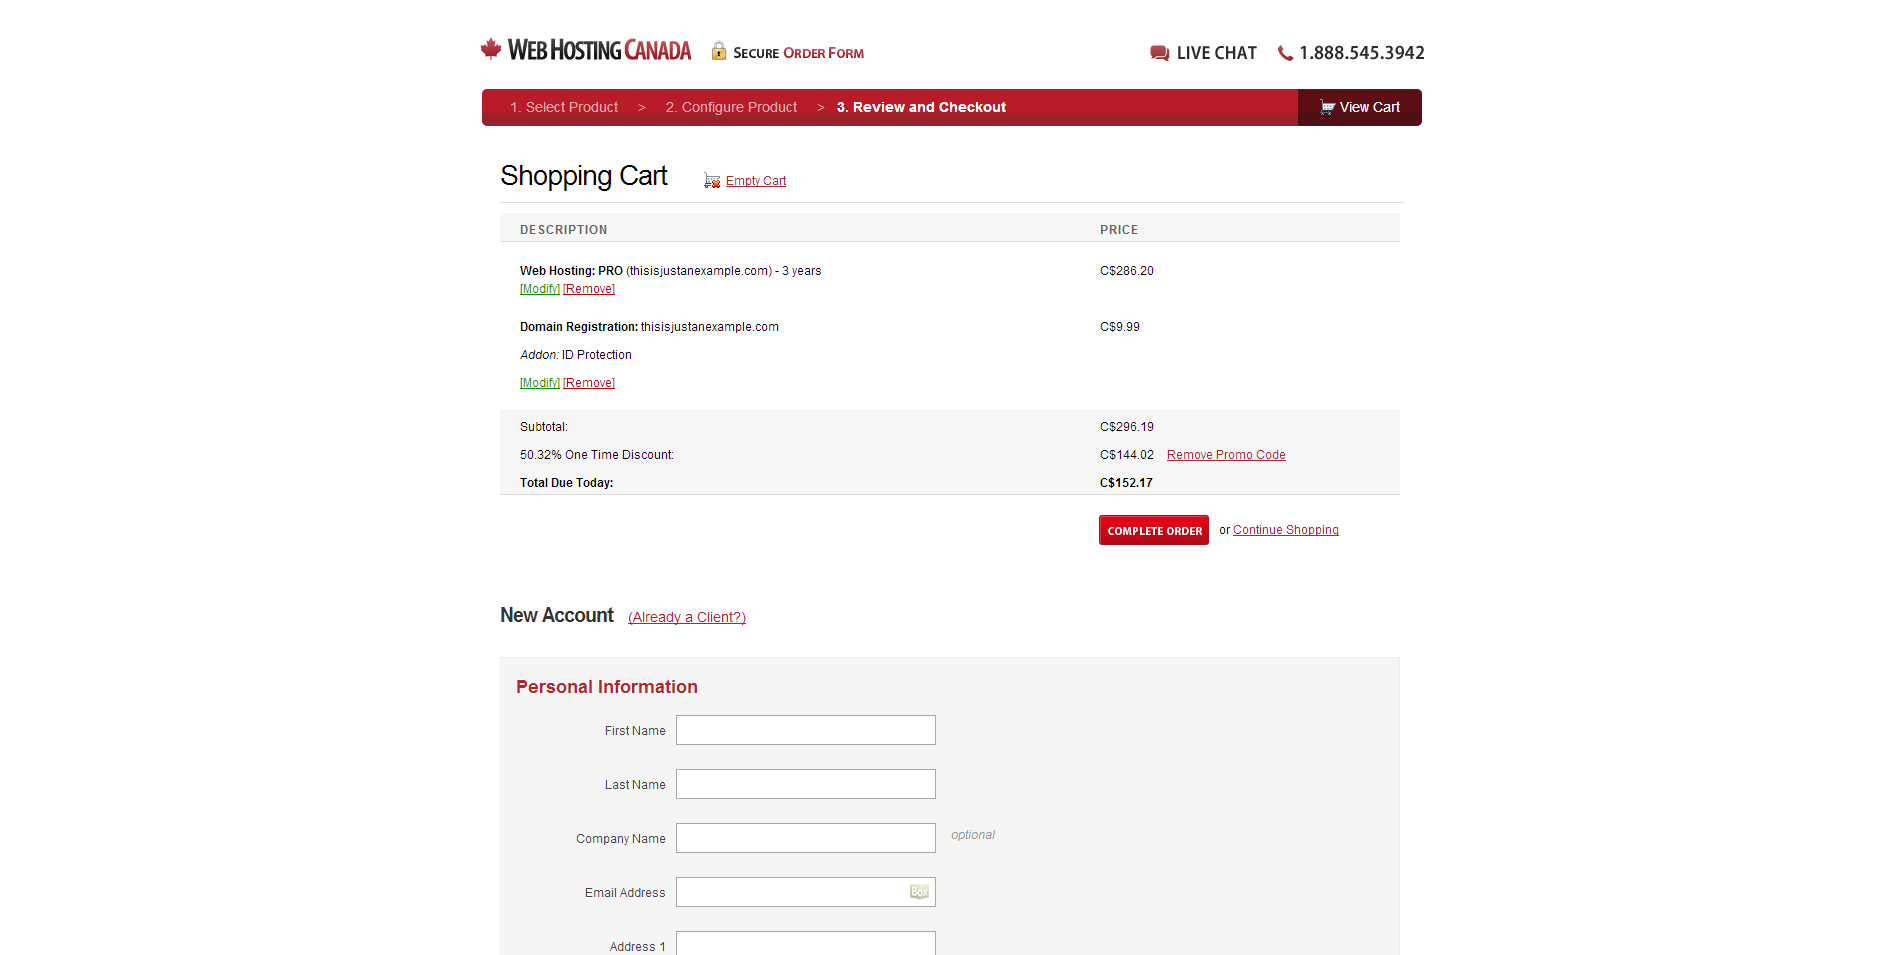 WHC.ca Billing Page